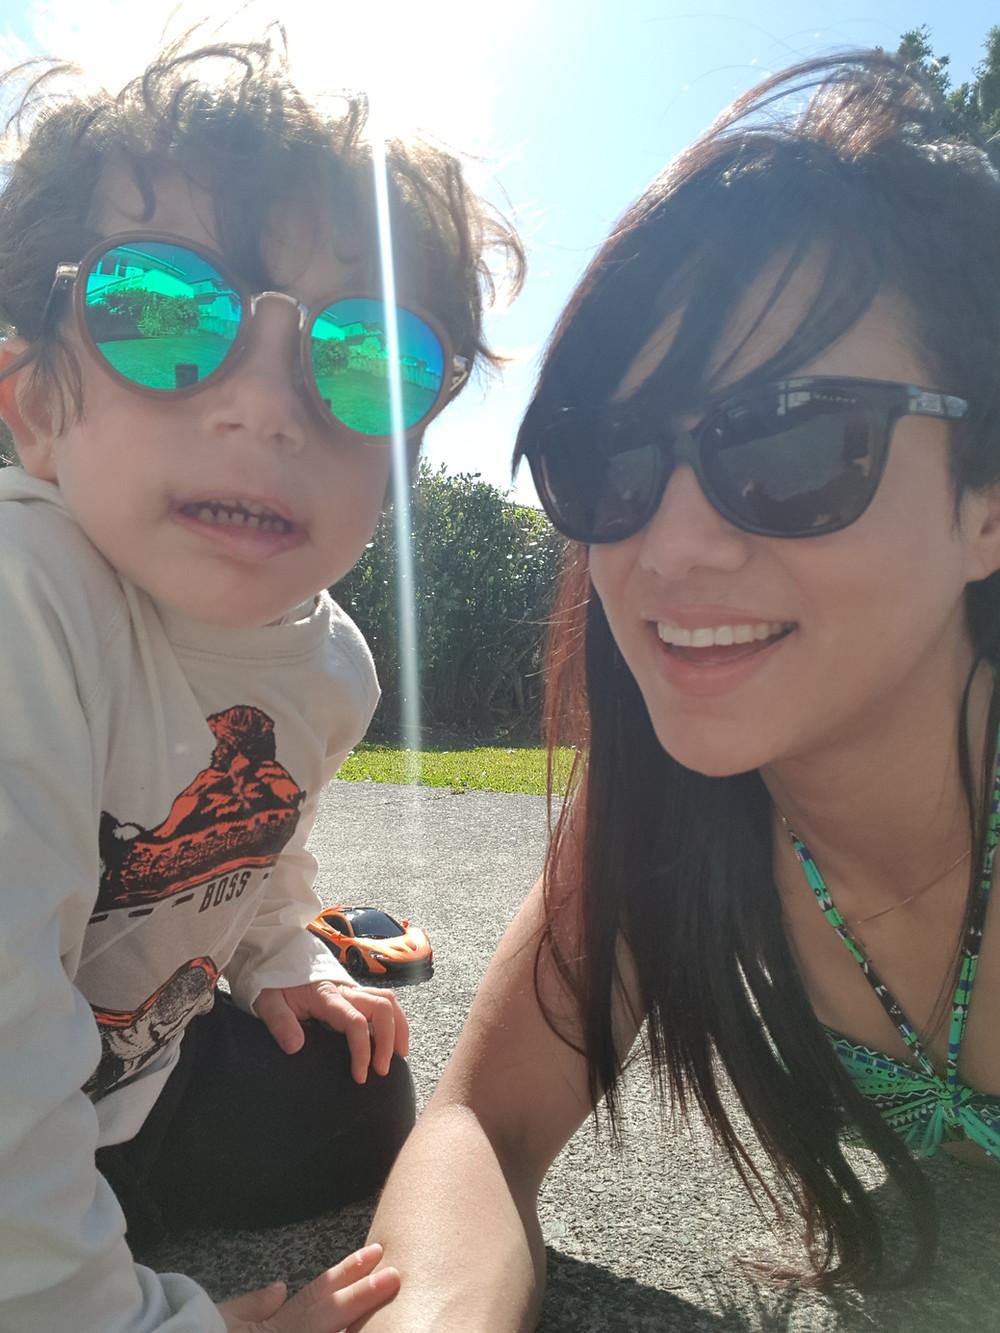 Katy Thomas Blogger Medicinal Marijuana Medical Cannabis is Medicine CBD THC Epilepsy Eddy at Home